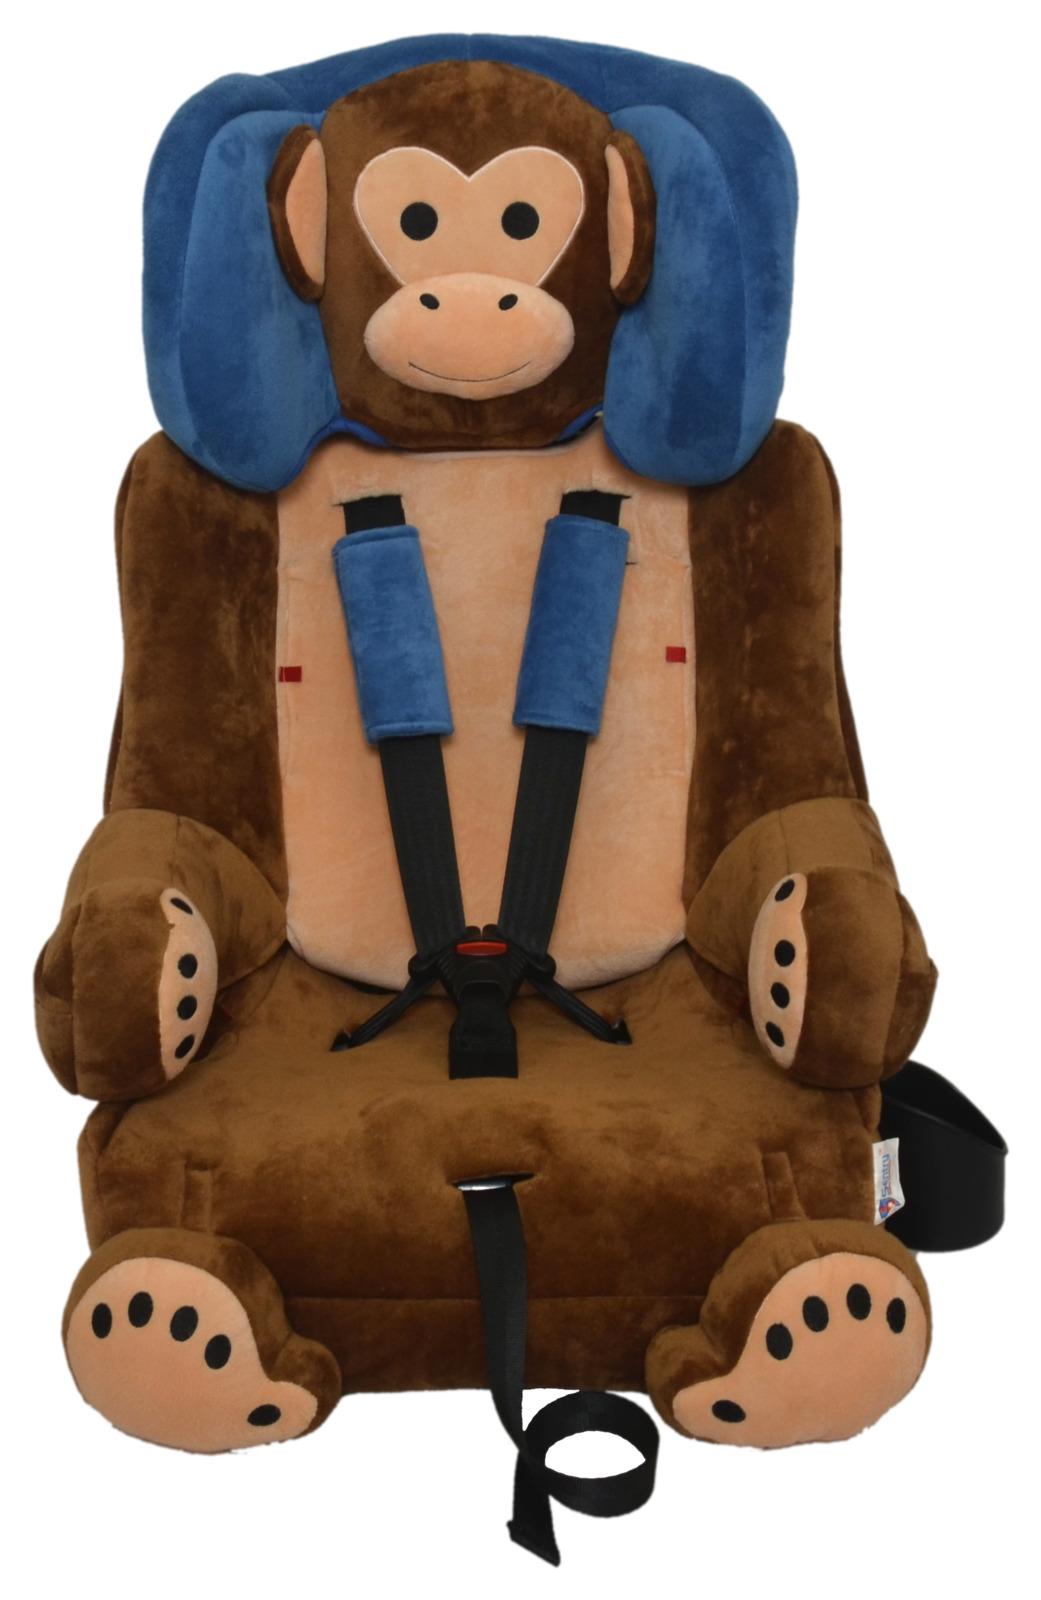 Sentry Baby Products Автокресло Обезьянка от 9 до 36 кг